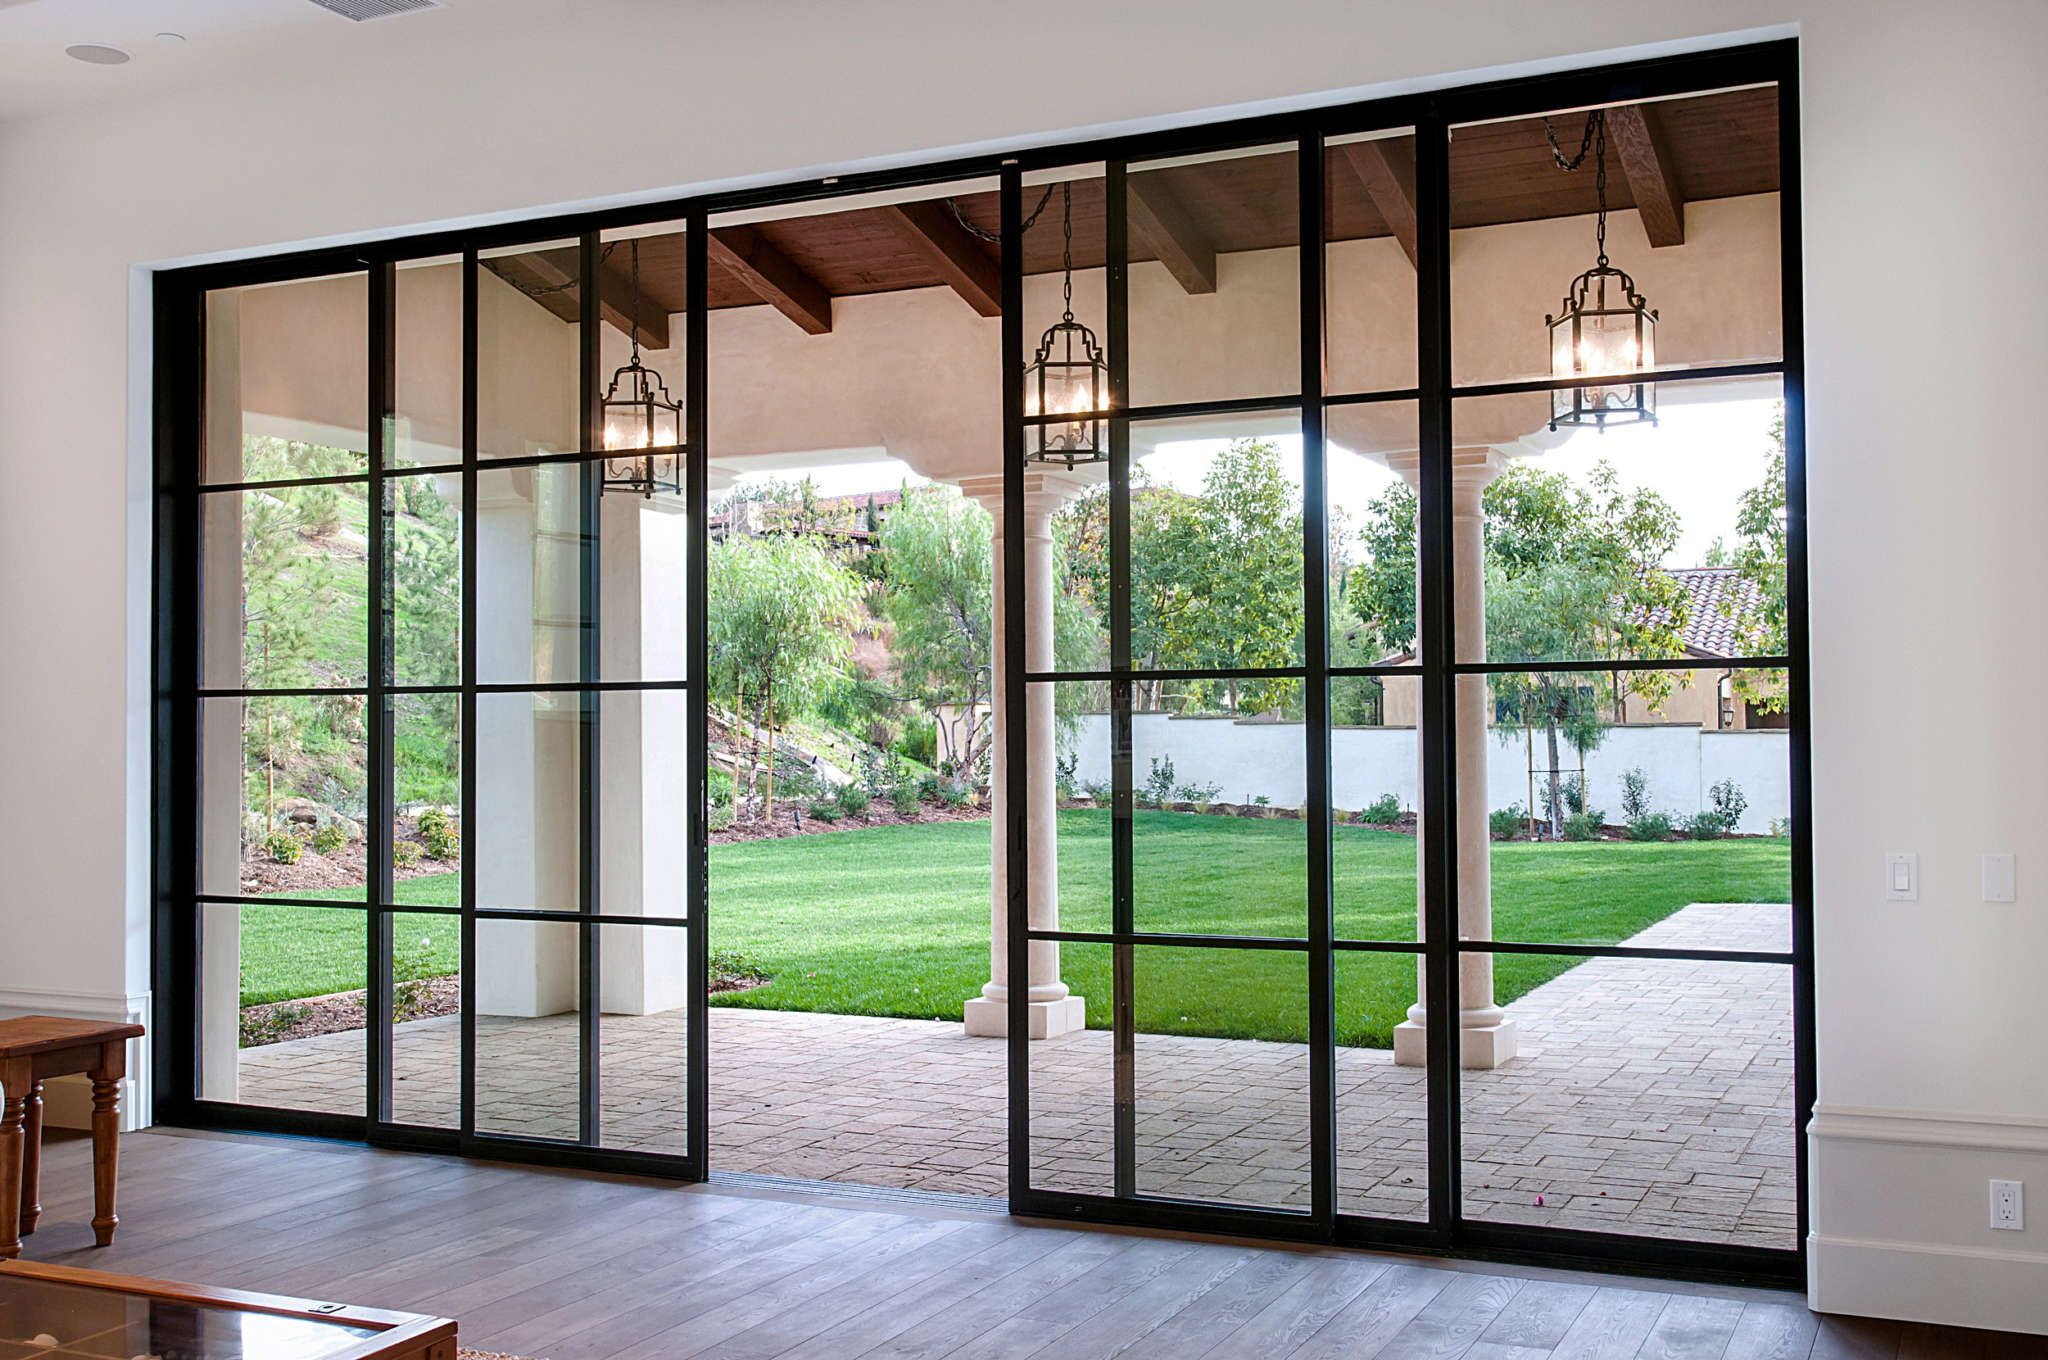 Shady Canyon Euroline Steel Windows Sliding Doors Exterior Sliding Door Design Sliding Doors Interior